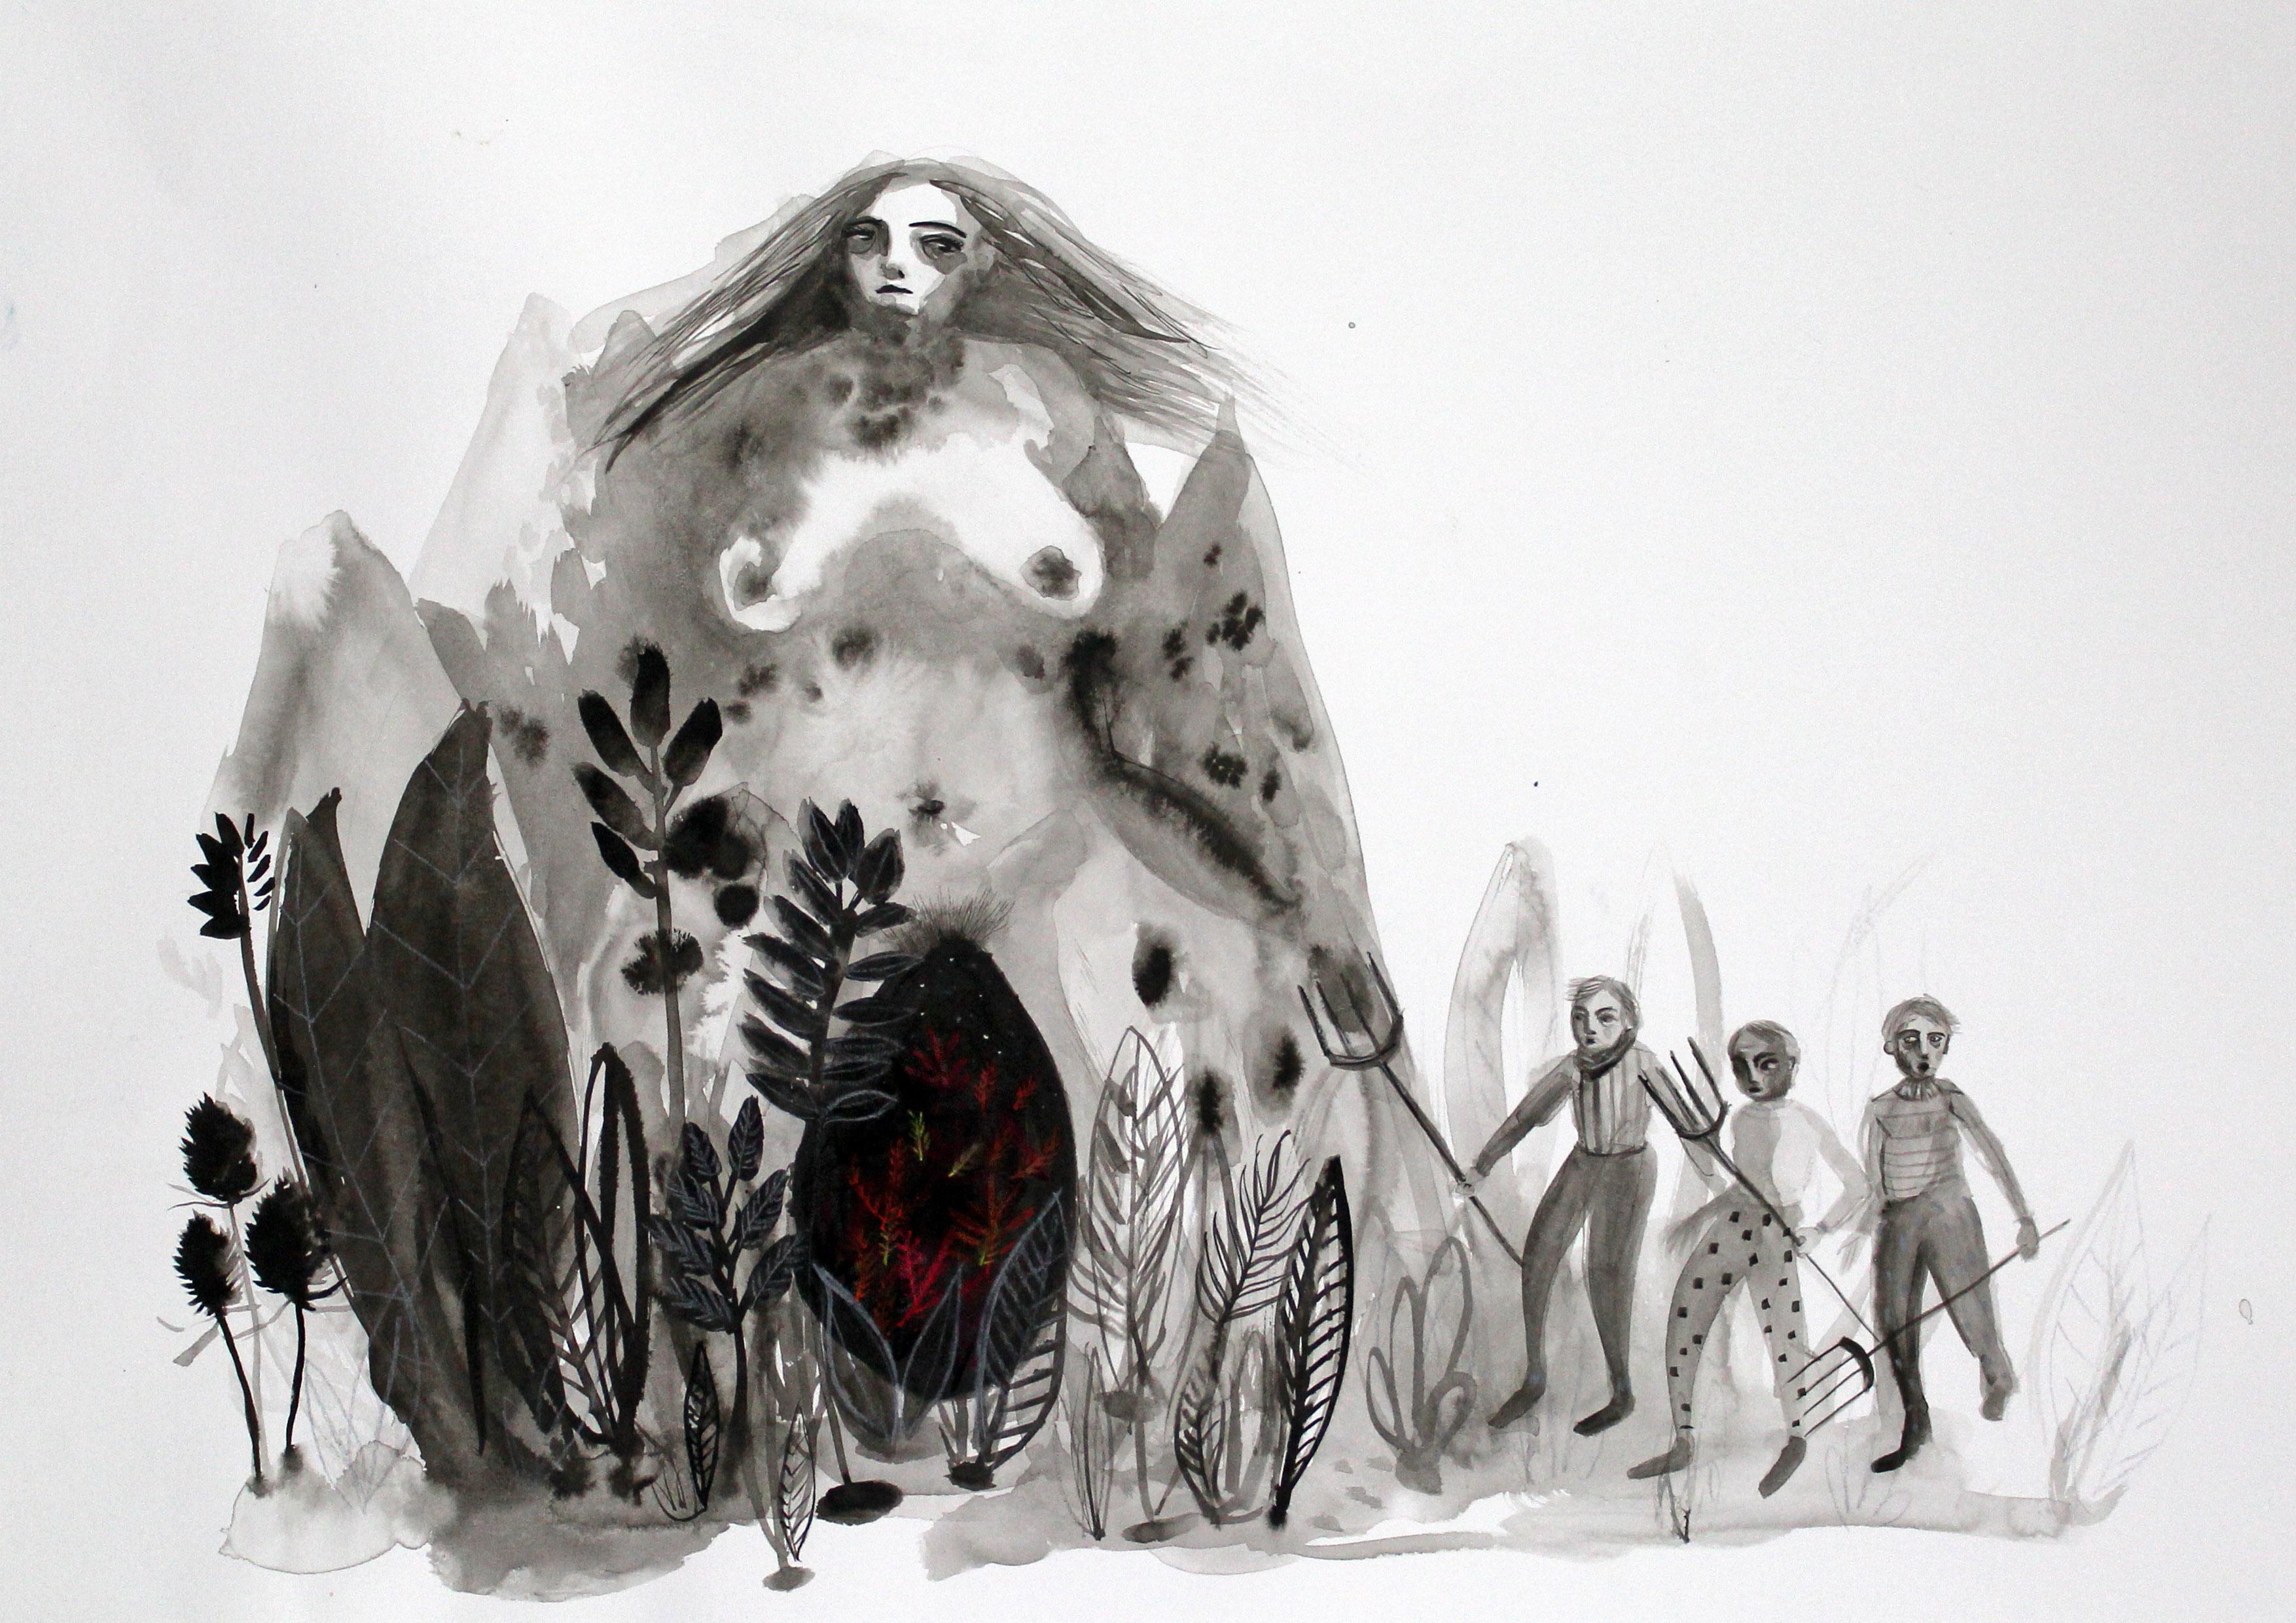 Monstrous Feminine by Layla Holzer 2015